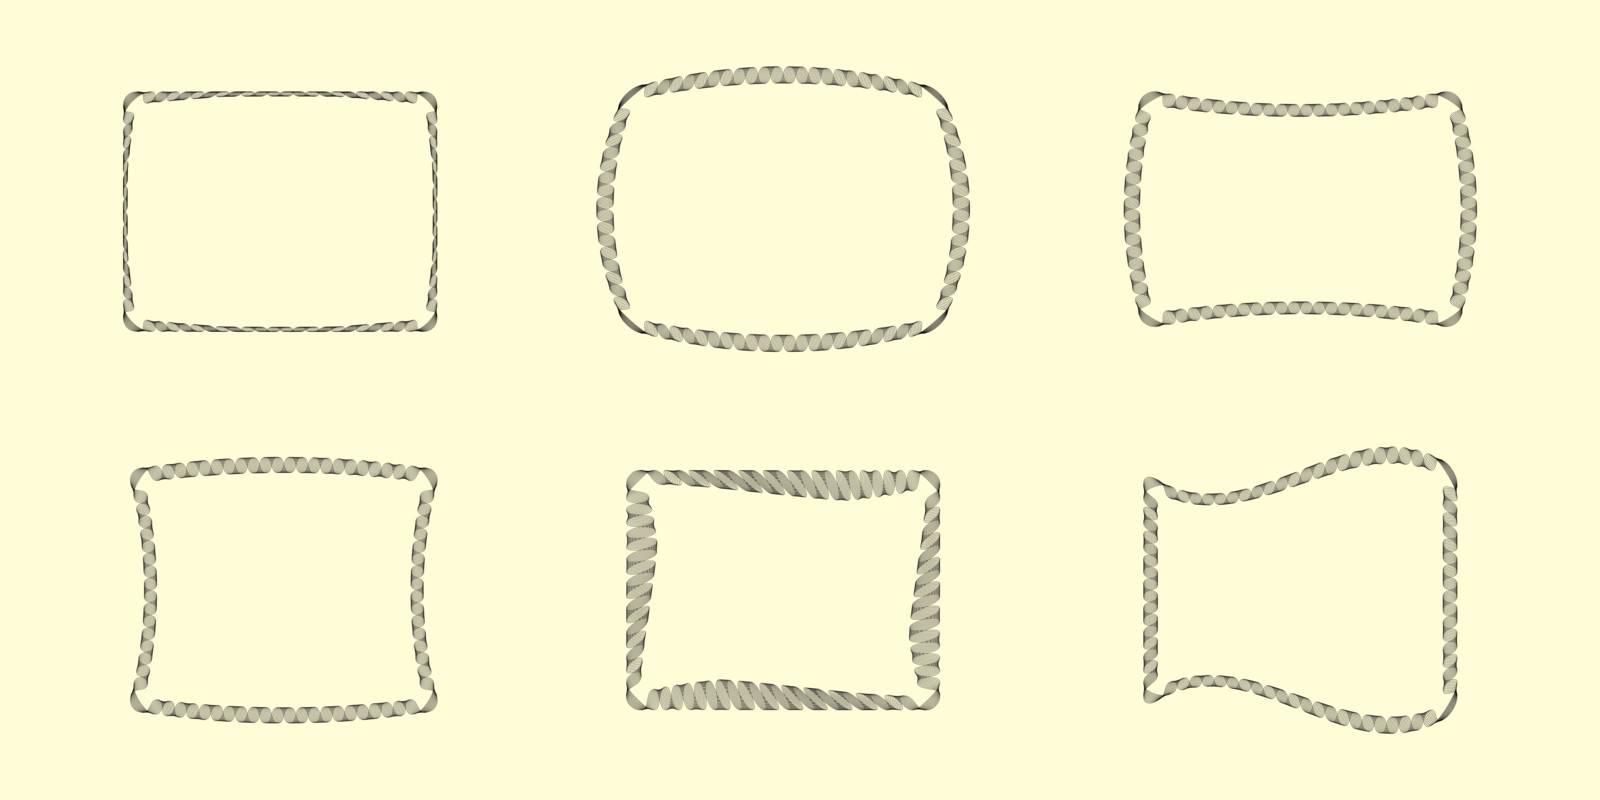 Six Vector Guilloche Borders (all stroke widths are editable)